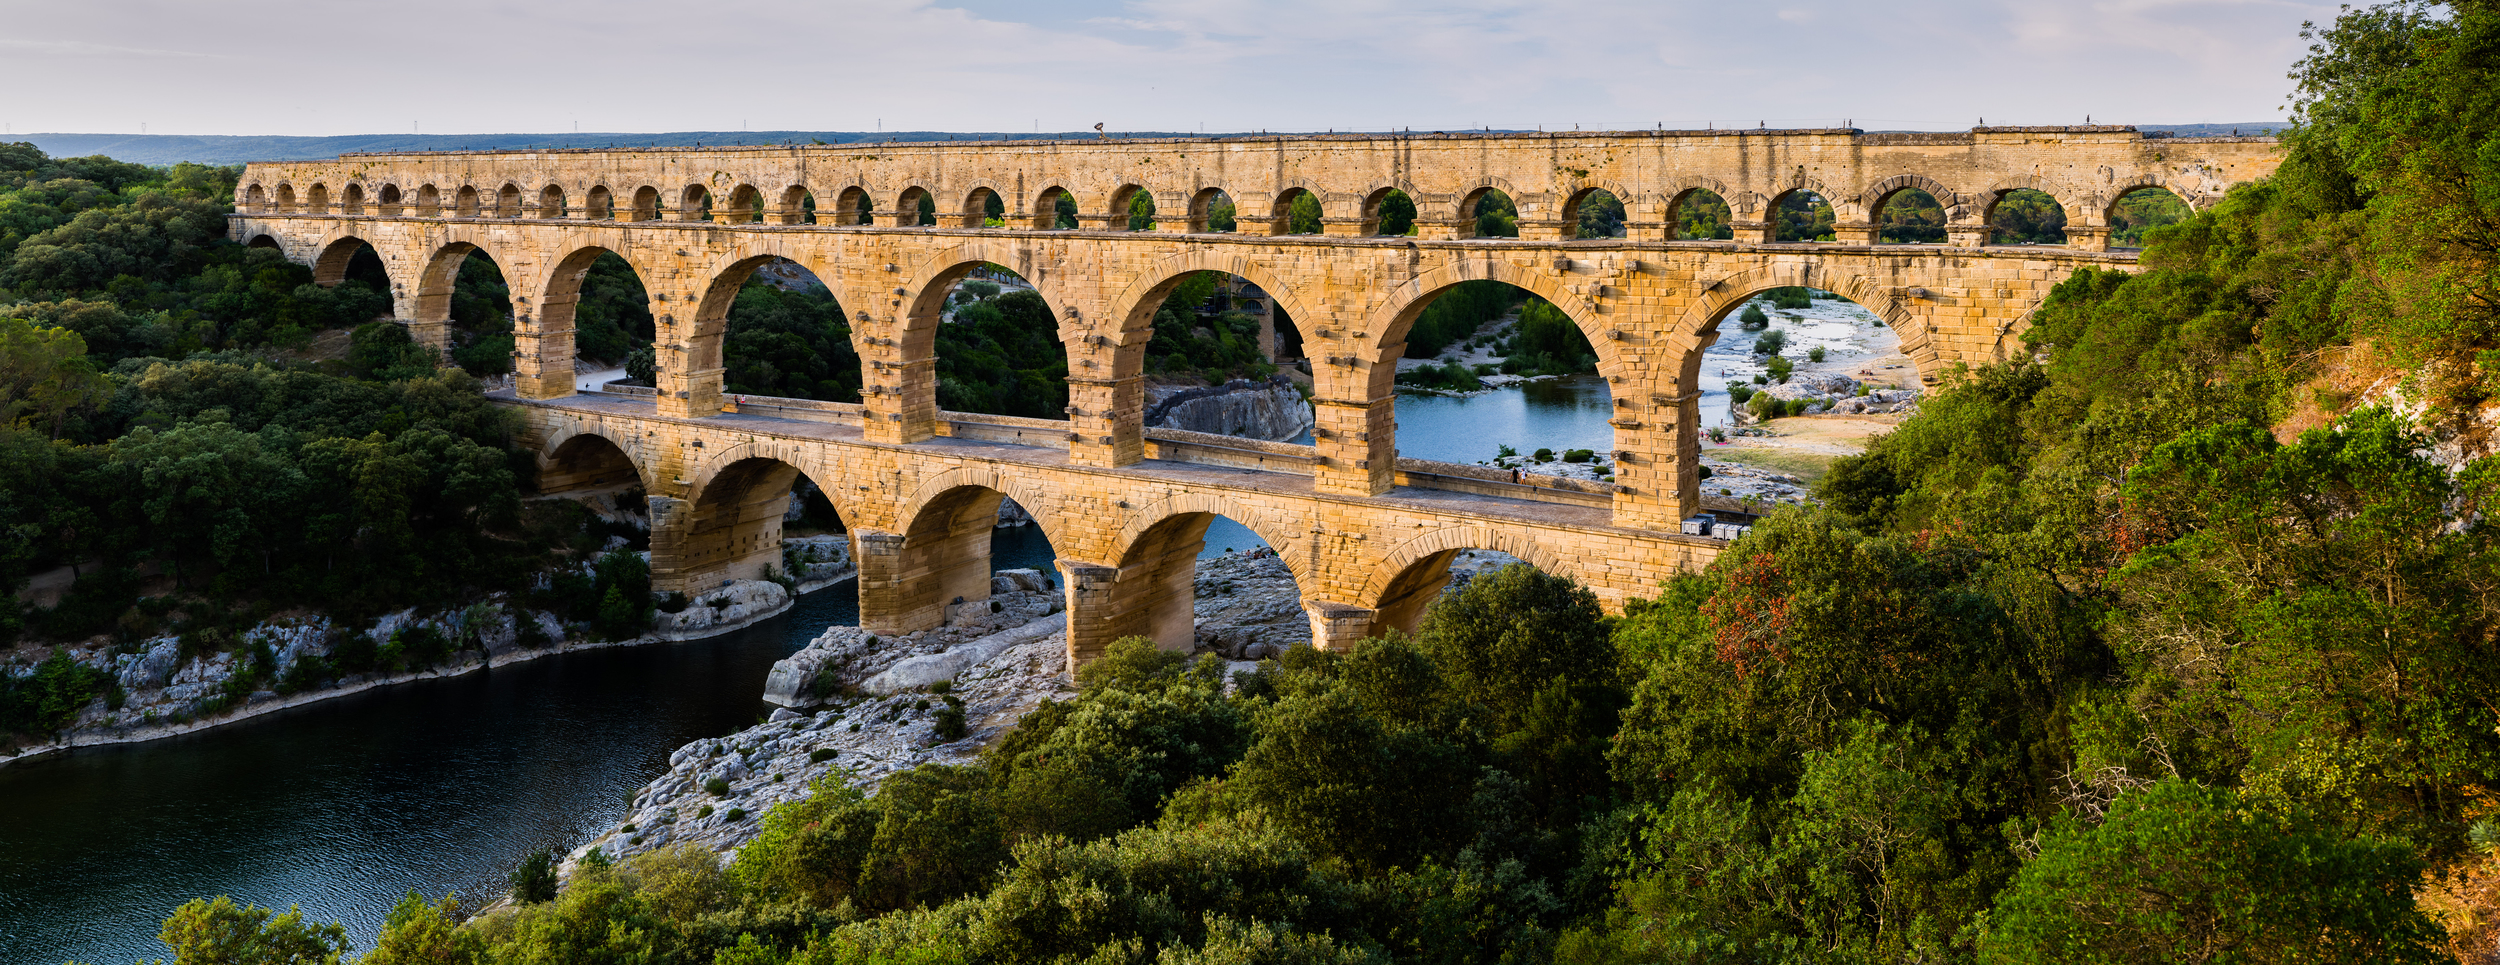 Provence Riviera - Pont_du_Gard.jpg